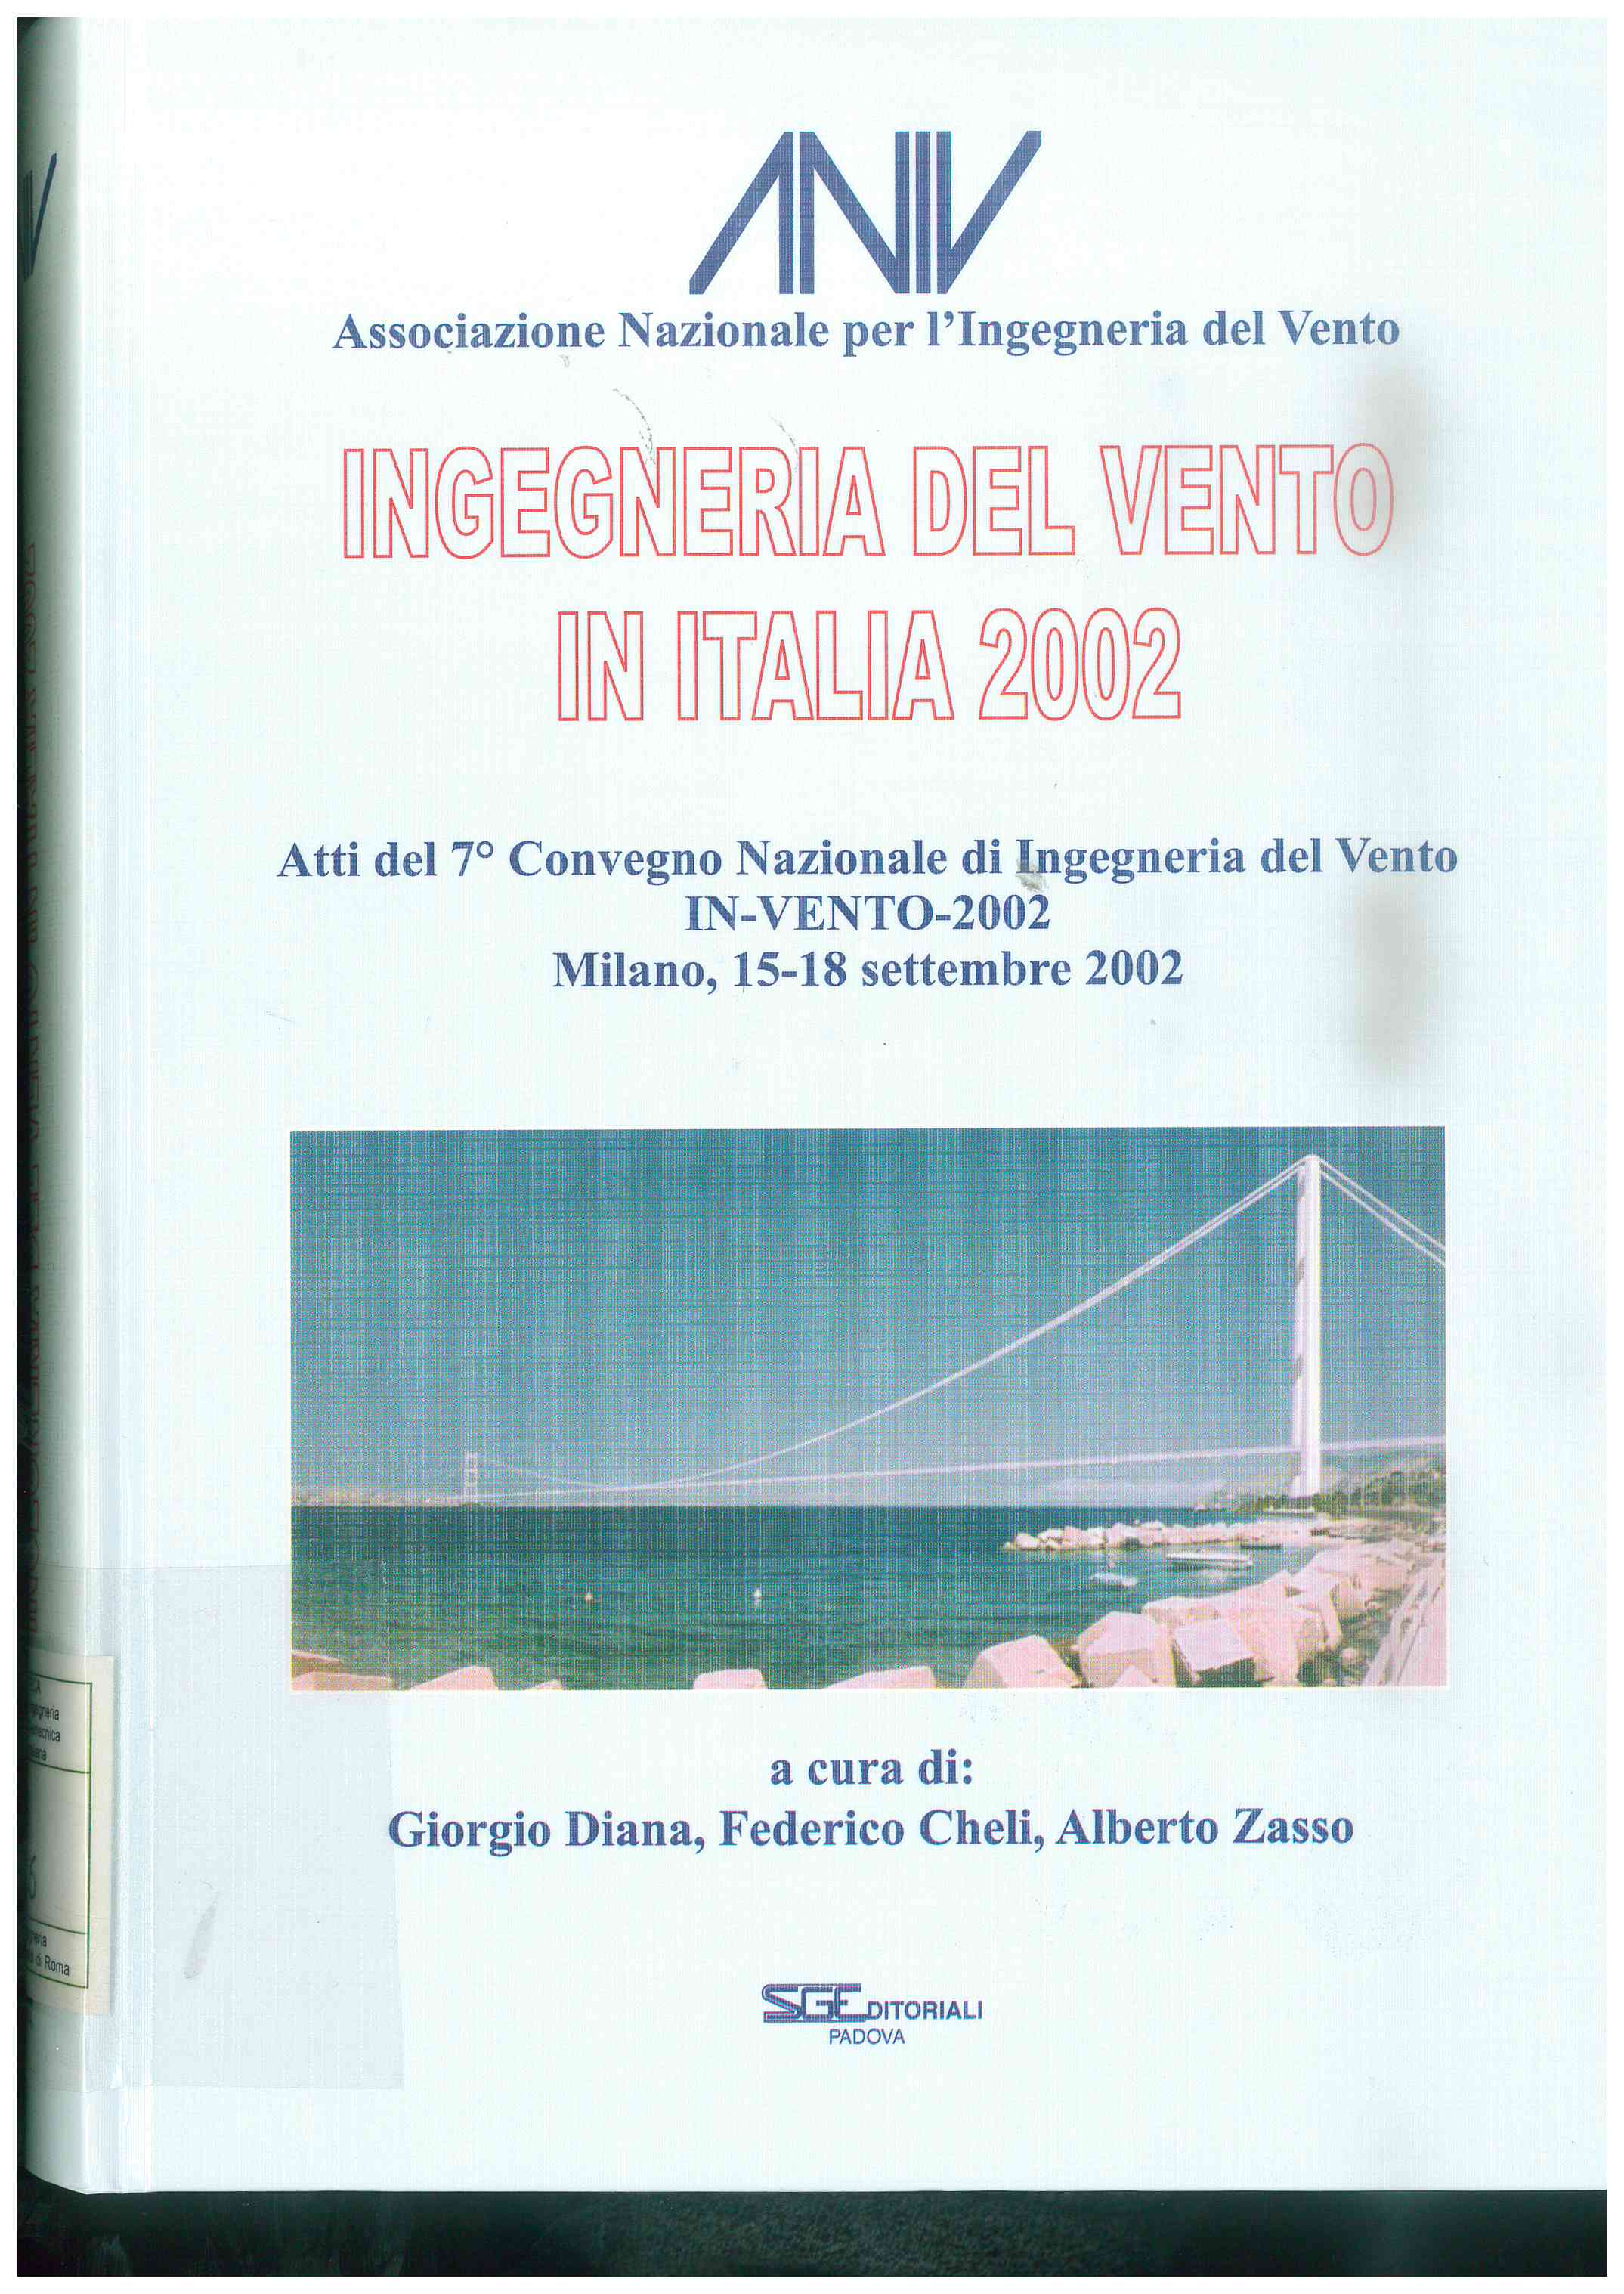 Ingegneria del vento in Italia 2002